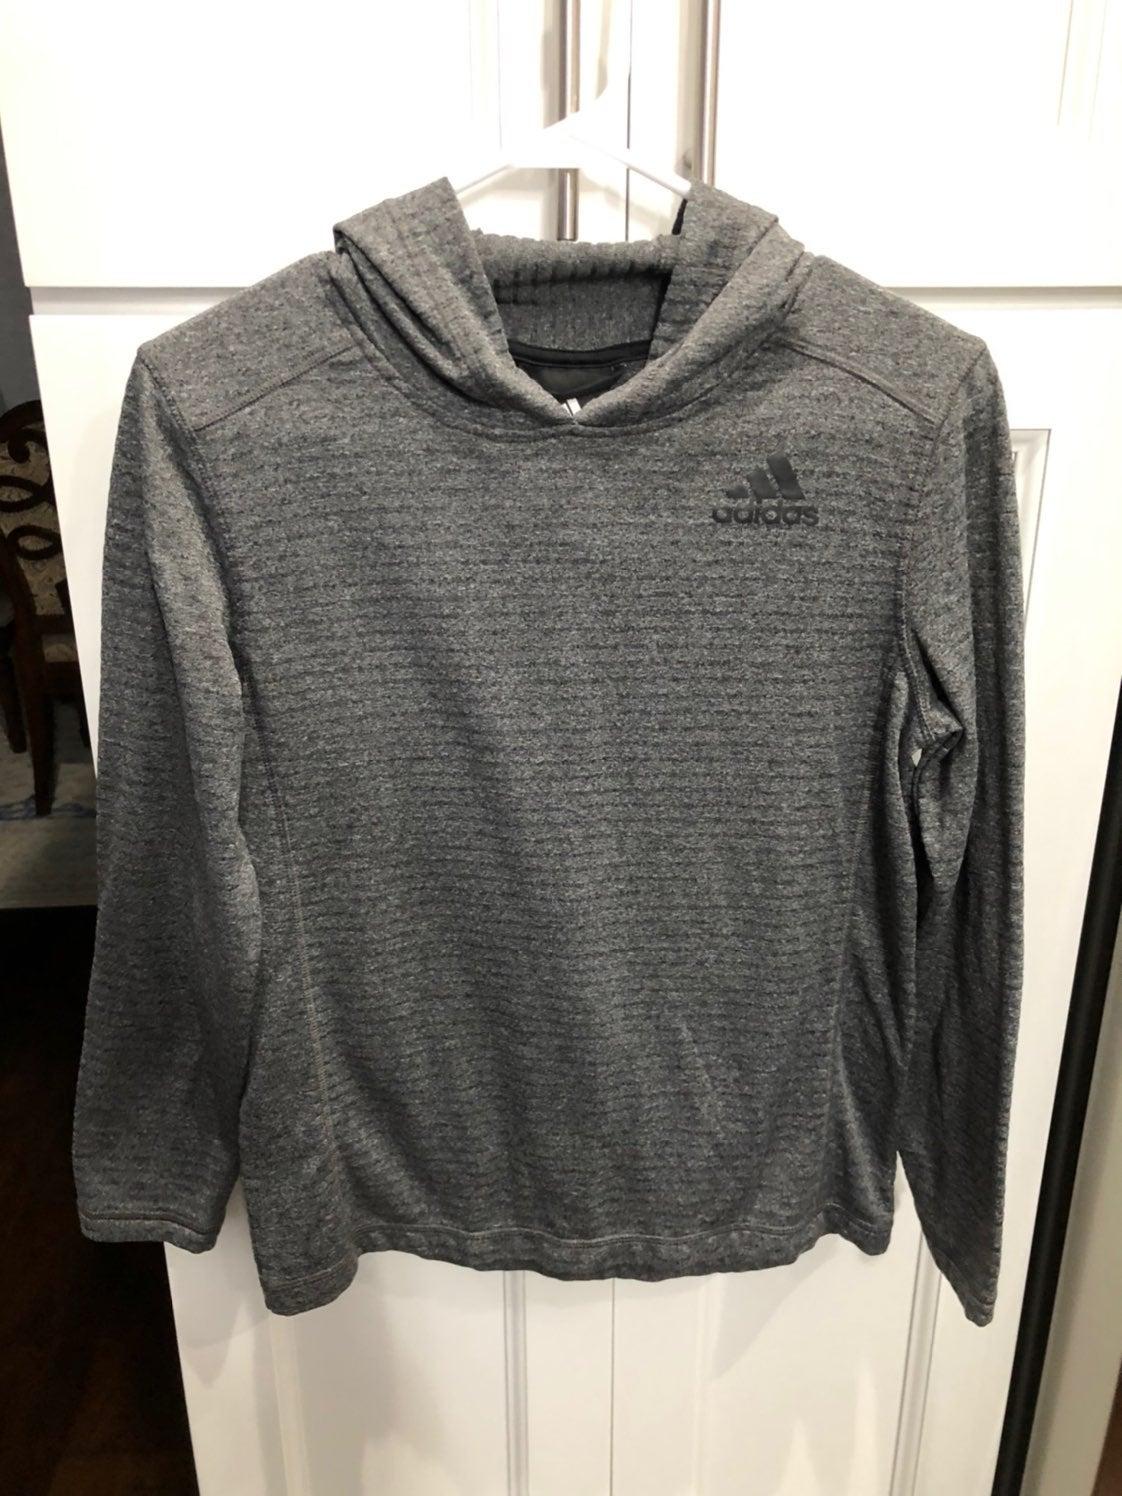 Medium Adidas hoodie